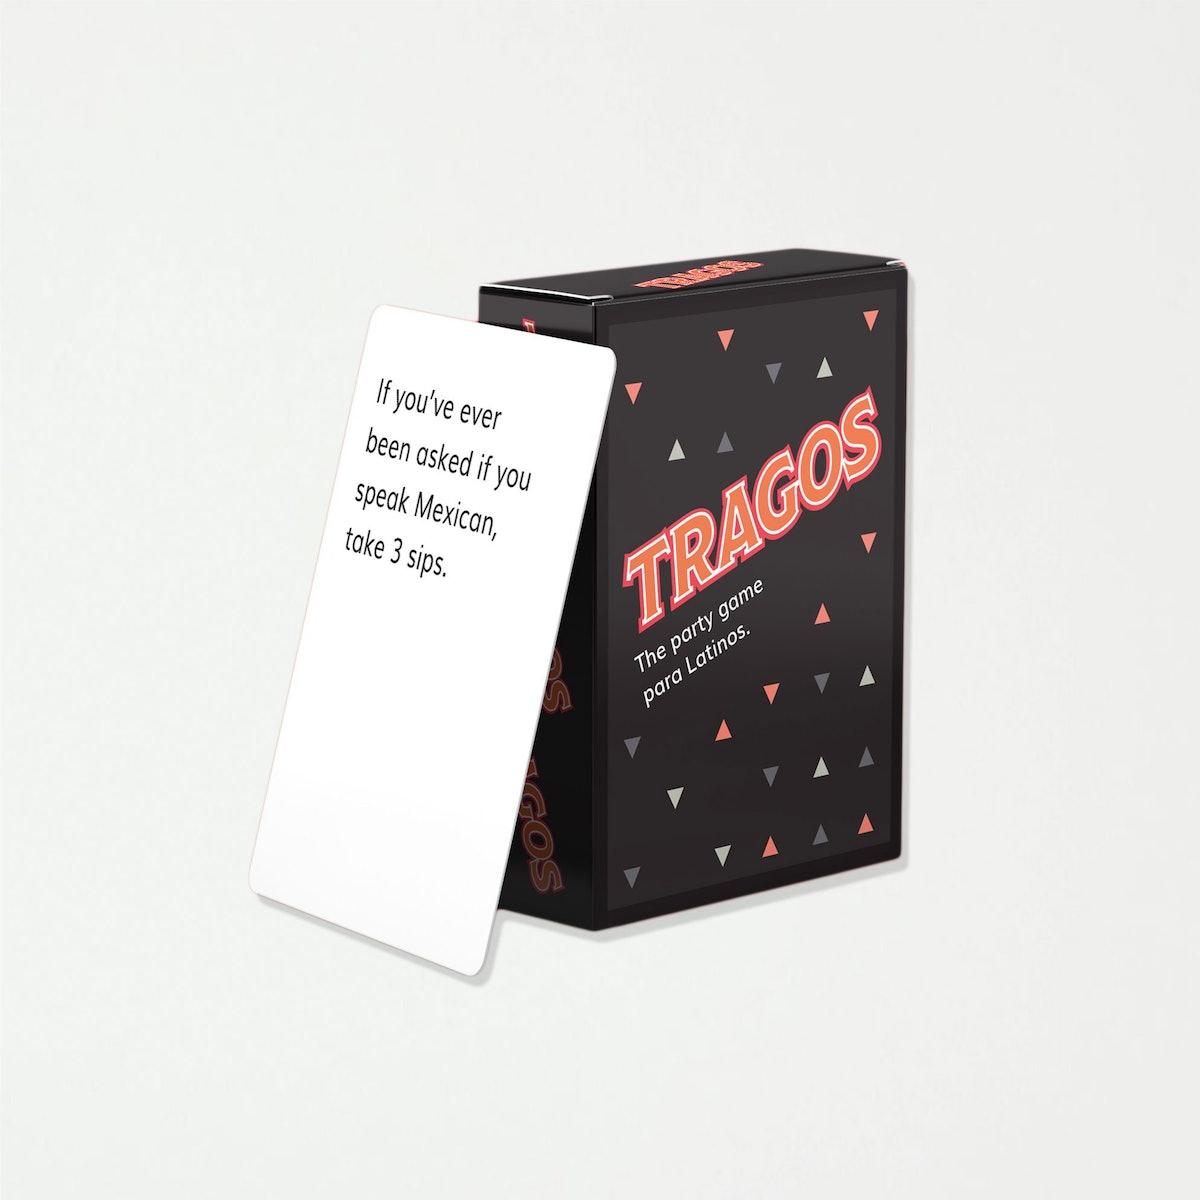 Tragos Original Party Card Game: image 1